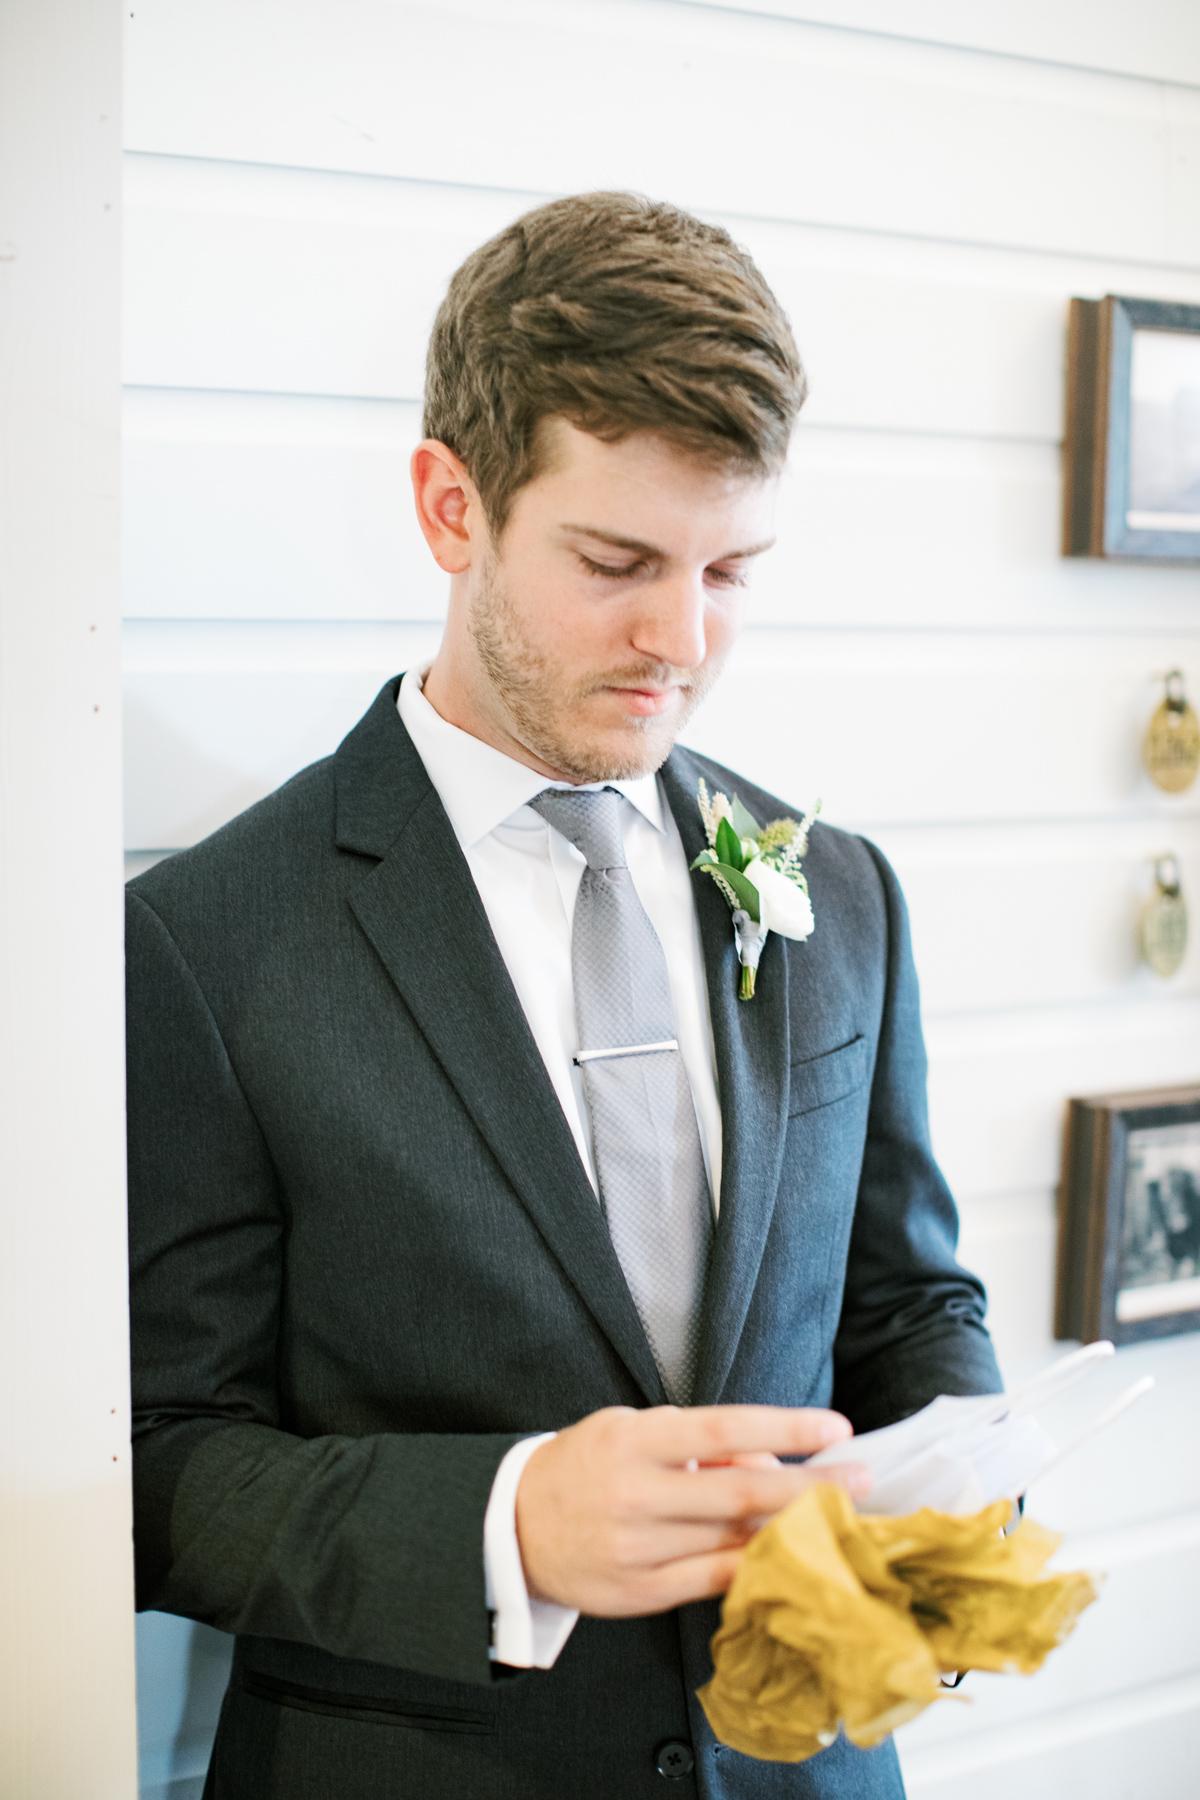 winmock-kinderton-wedding-025.jpg